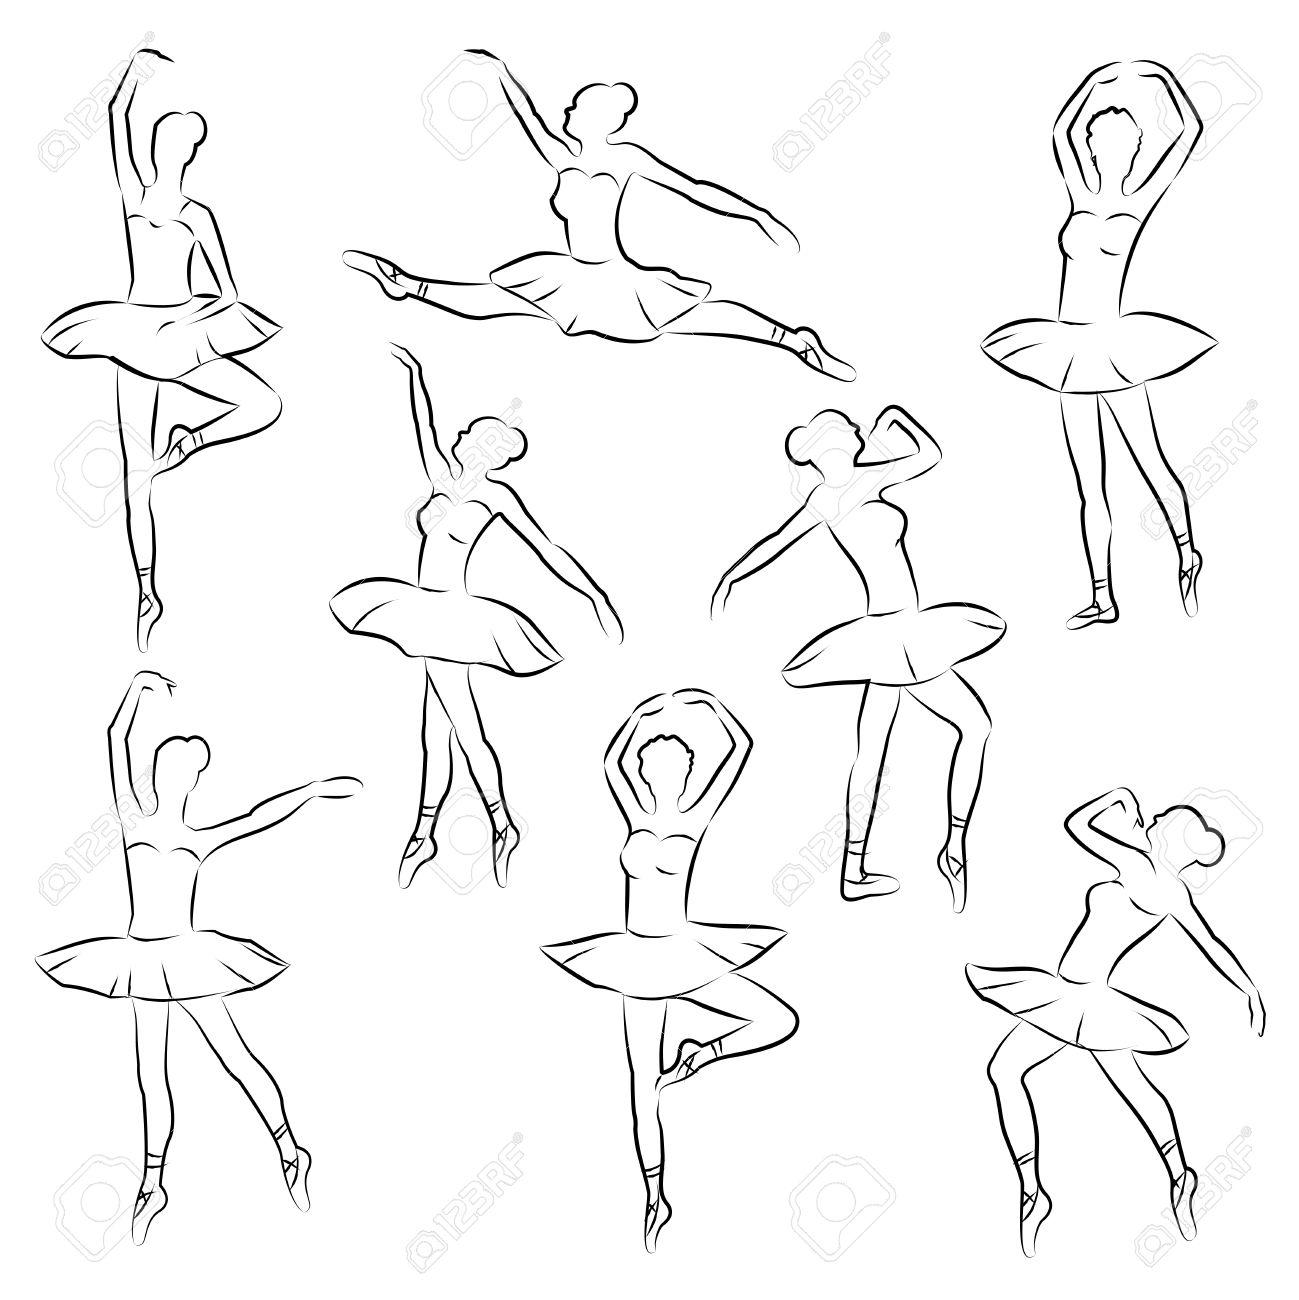 1299x1300 Ballet Outline Ballerina Dancer Figure Royalty Free Cliparts